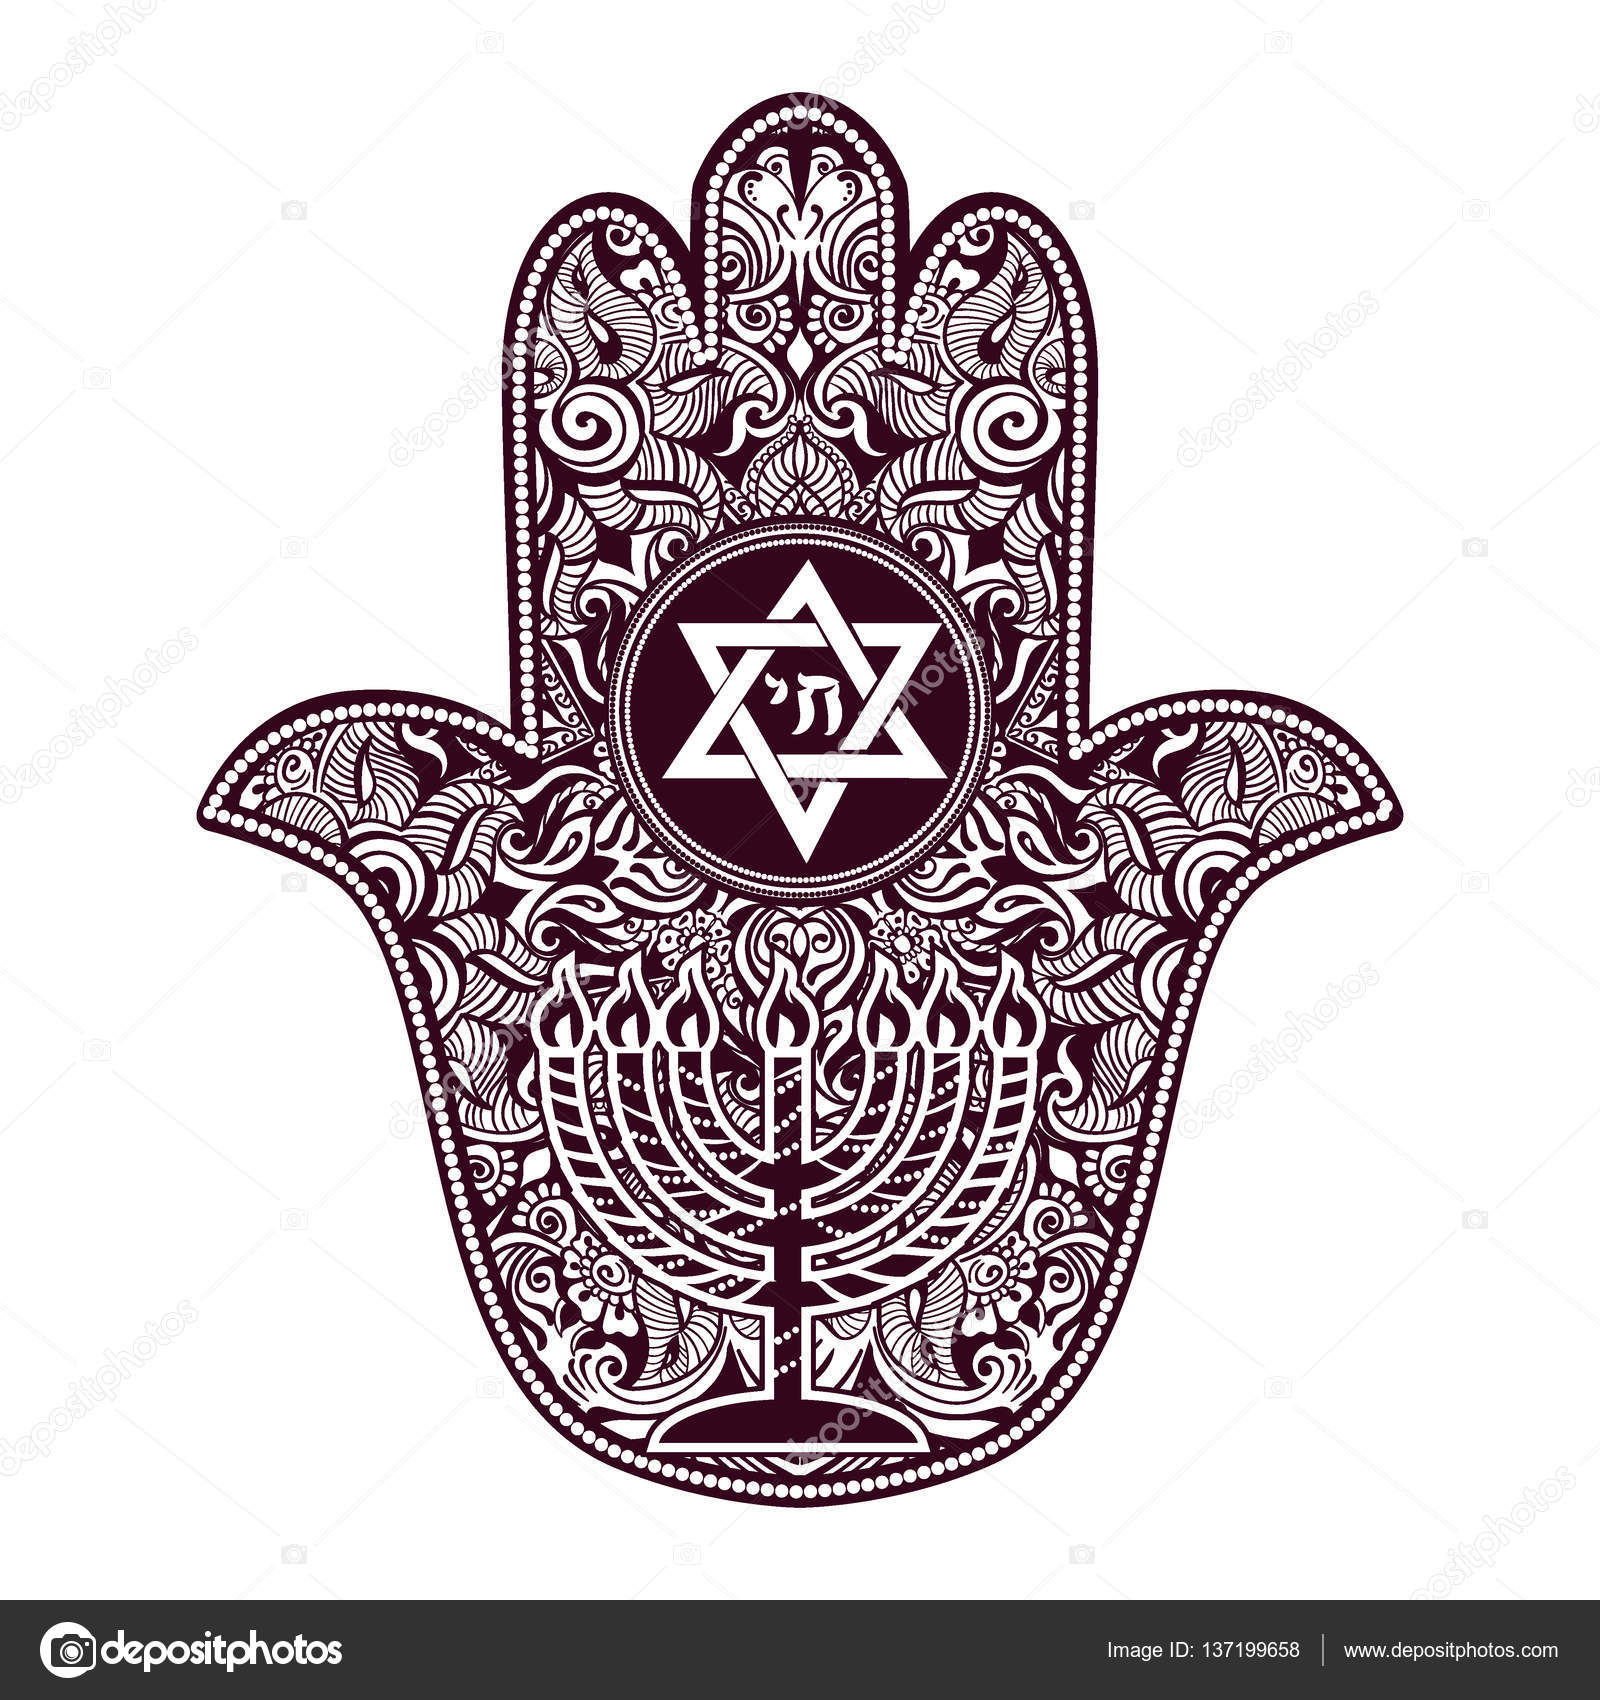 Jewish hamsa tattoo stock vector yulianas 137199658 jewish sacred amulet and religious symbols menorah hanukkah lamp hamsa or hand of miriam palm of david star of david rosh hashanah hanukkah biocorpaavc